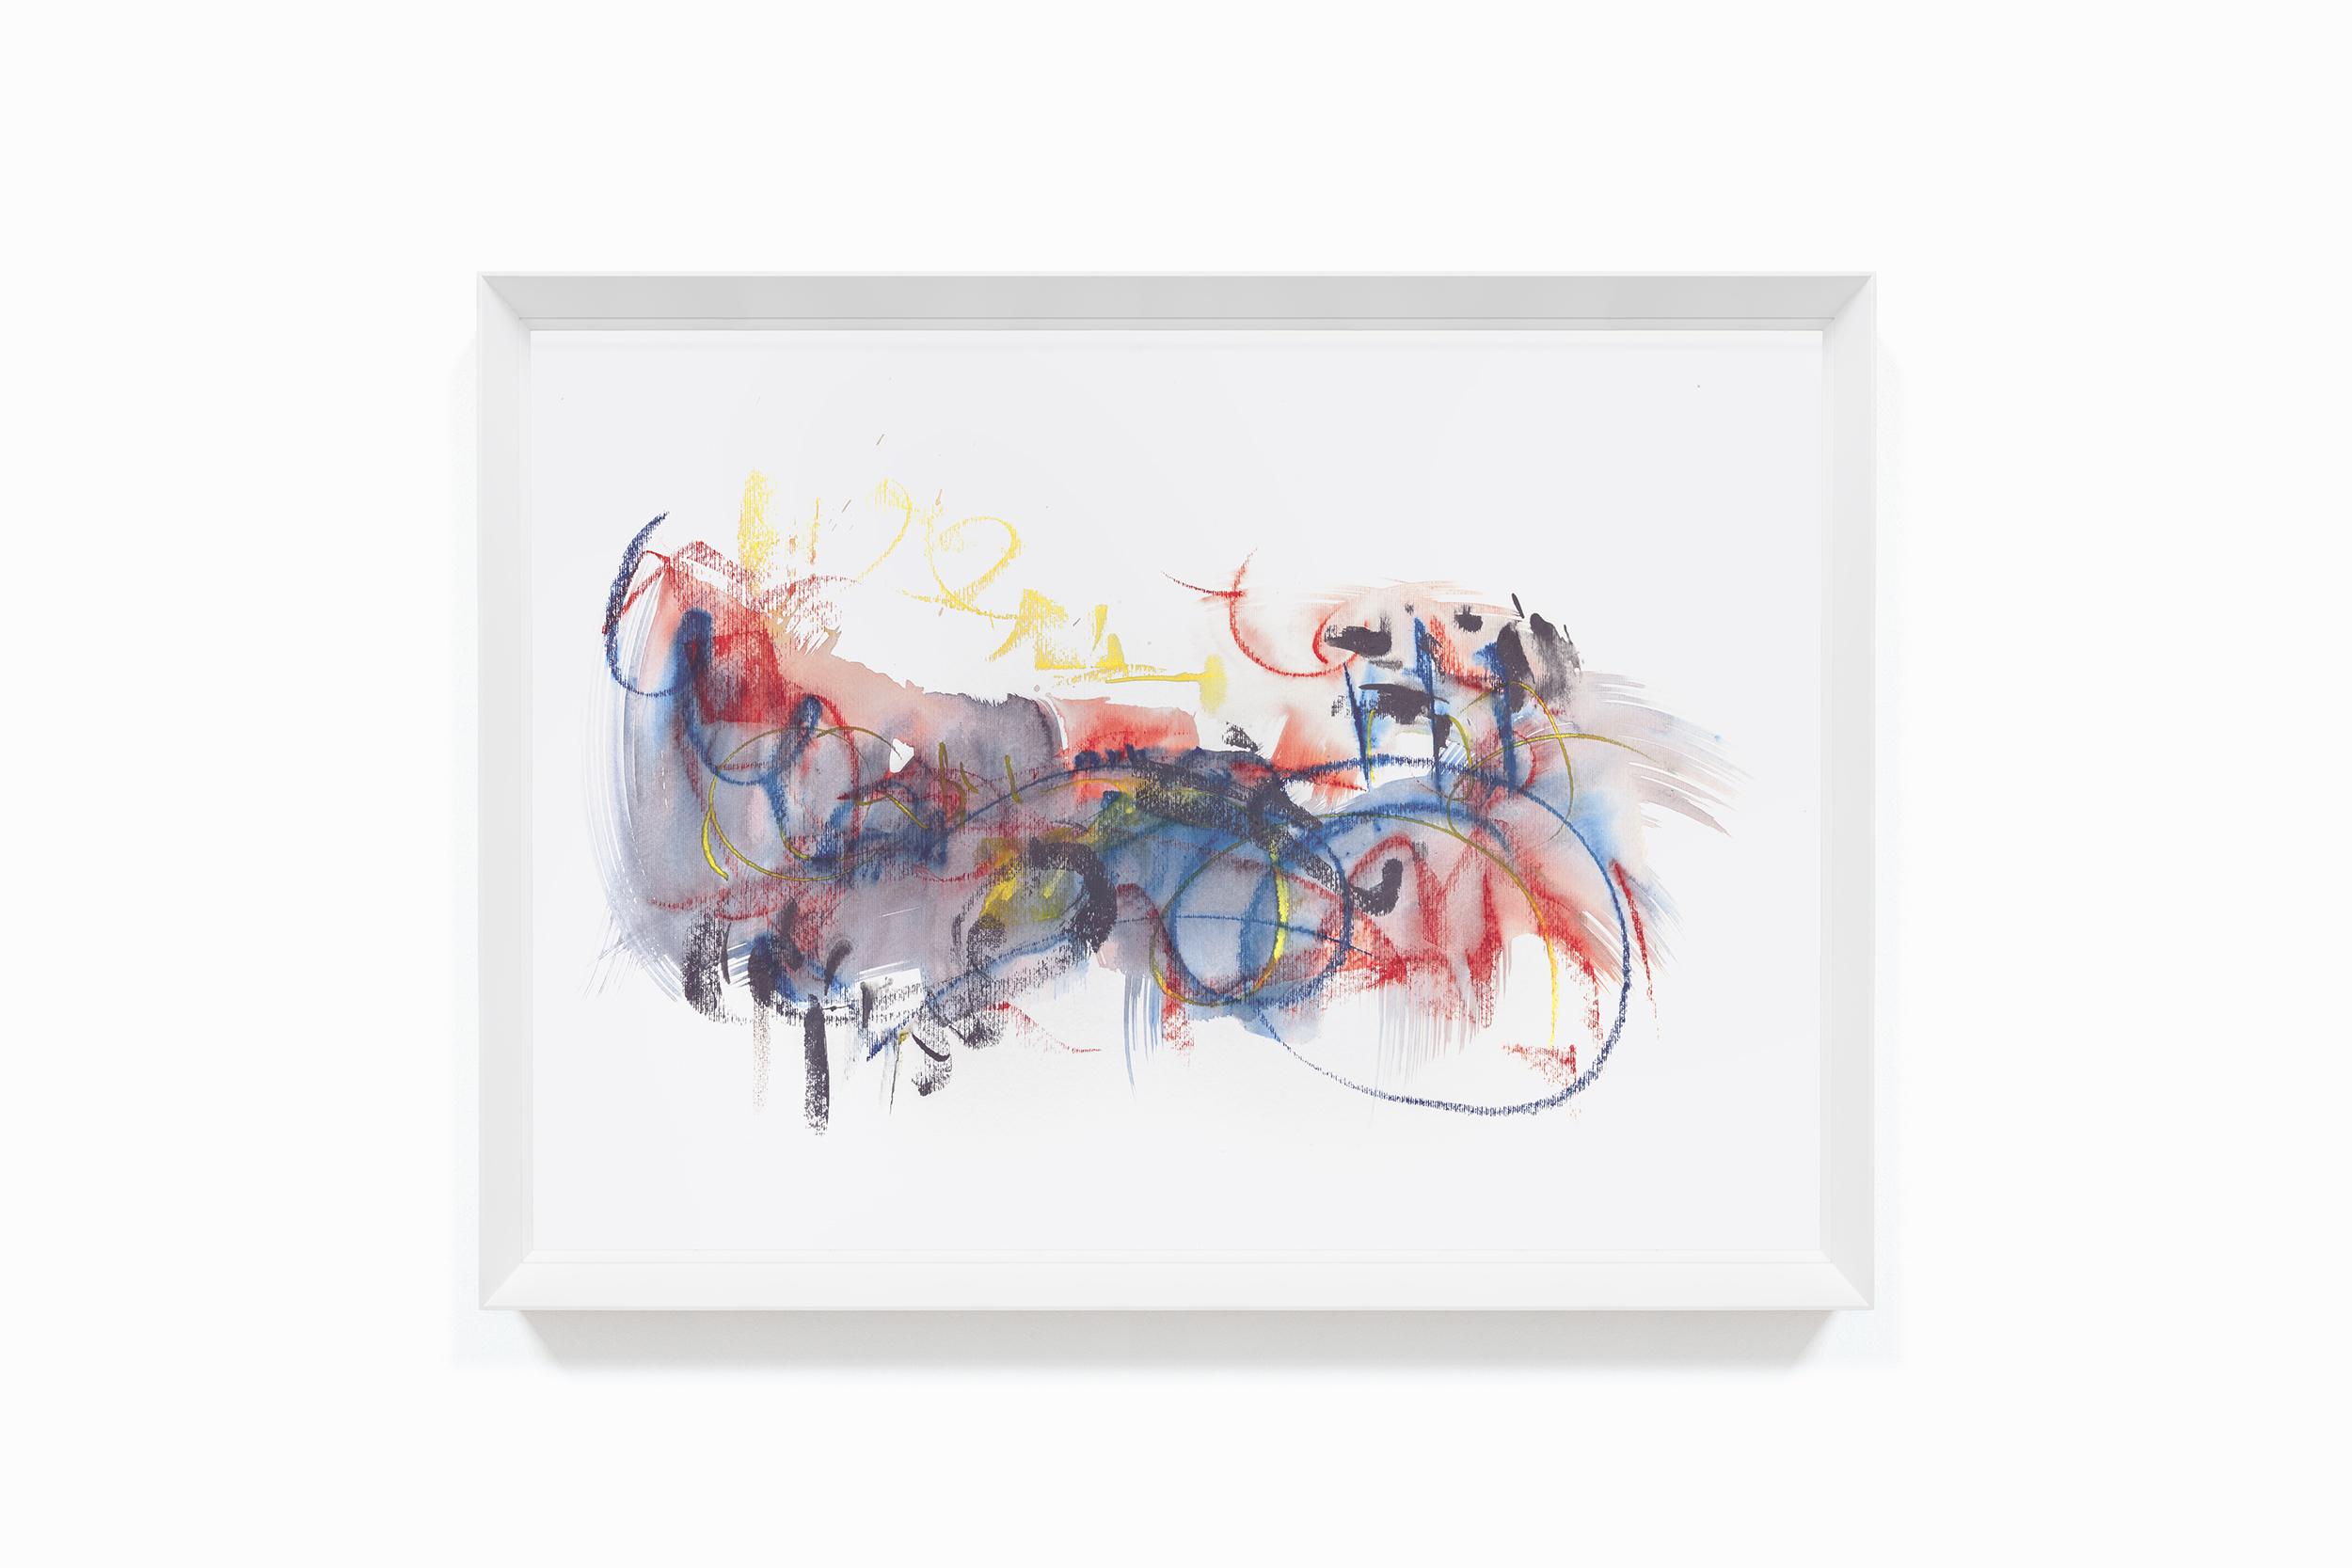 159 Andre Gigante Pintura Painting bonjourmolotov La.jpg